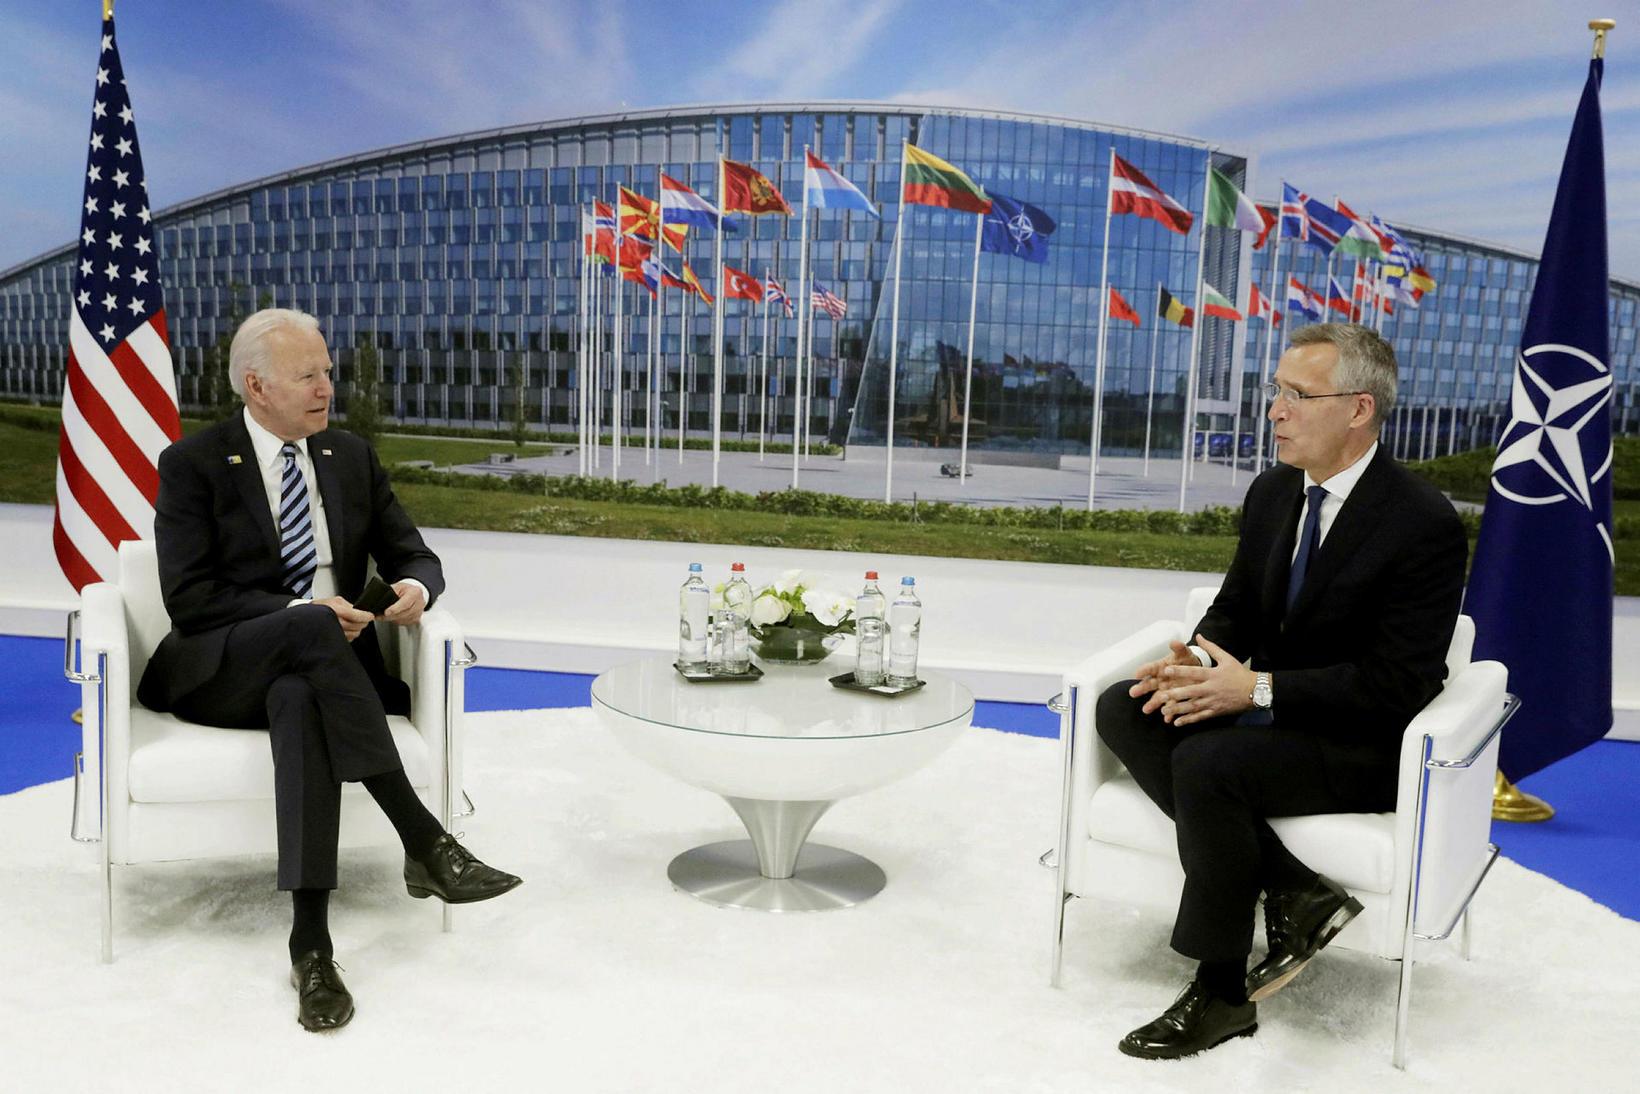 Joe Biden, forseti Bandaríkjanna og Jens Stoltenberg, framkvæmdastjóri Atlantshafsbandalagsins.